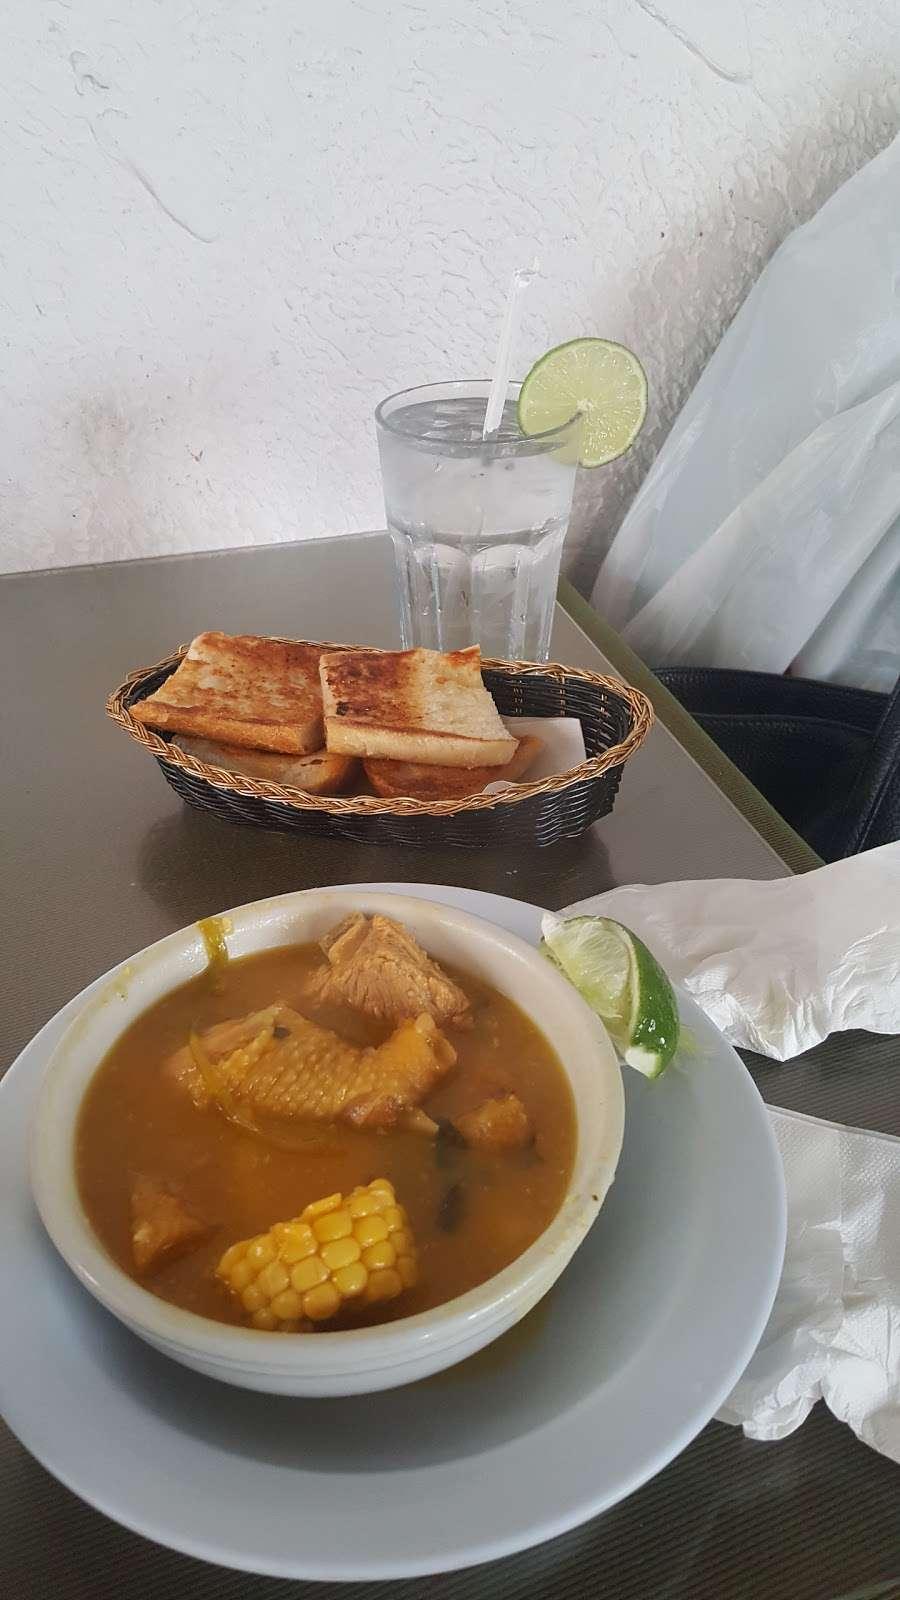 Fiesta Cafe and Bar - cafe  | Photo 6 of 10 | Address: 4640 Third Ave, Bronx, NY 10458, USA | Phone: (718) 733-2211